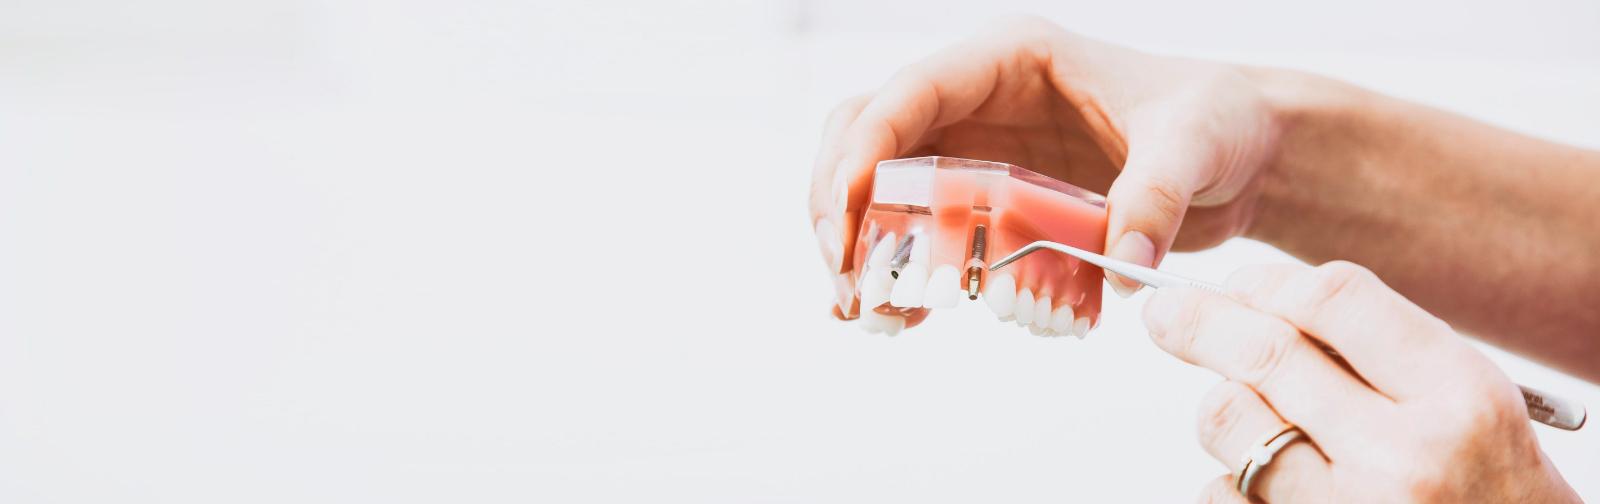 Dental Clinic Group - Implantología